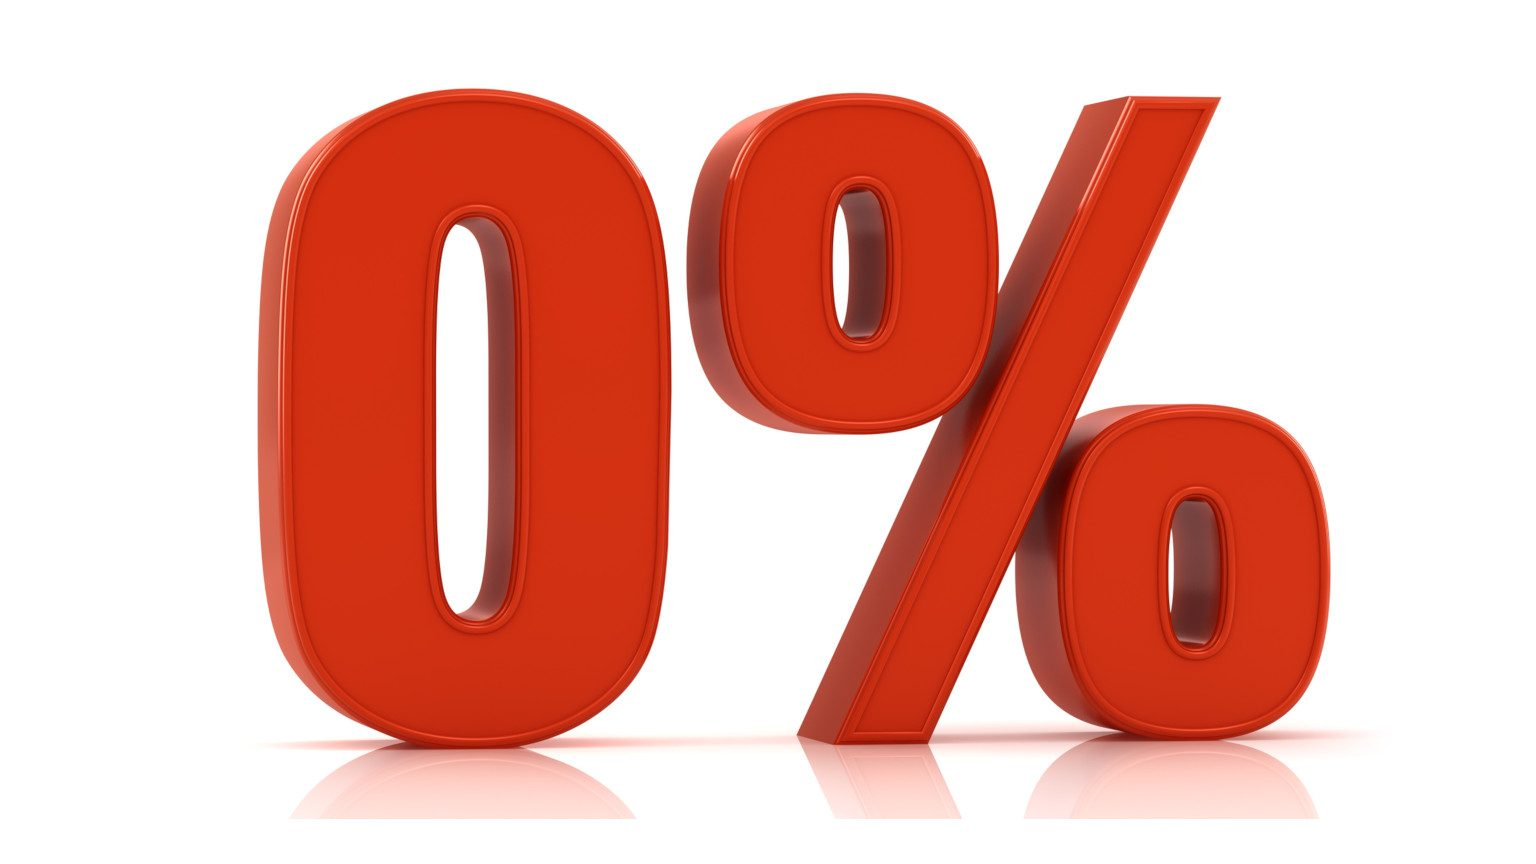 Red zero percent sign